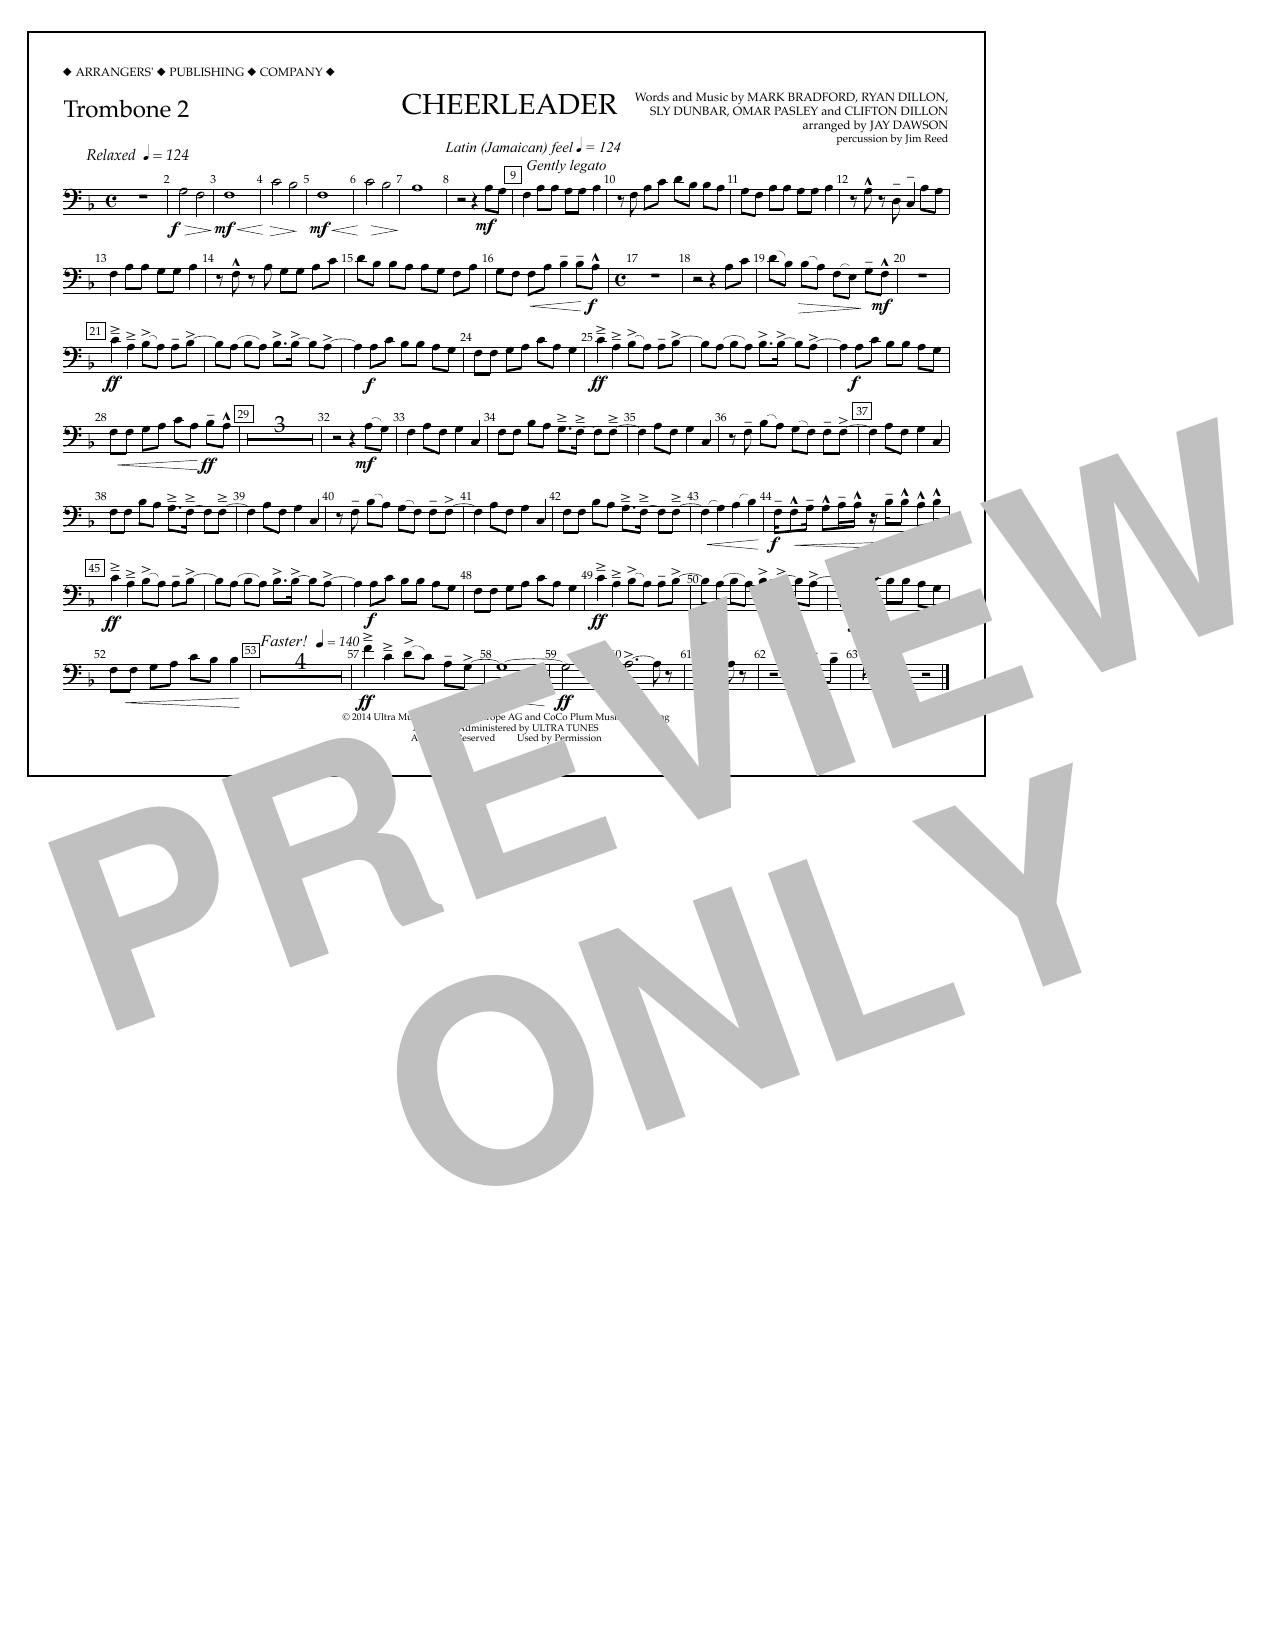 Jay Dawson Cheerleader - Trombone 2 sheet music notes and chords